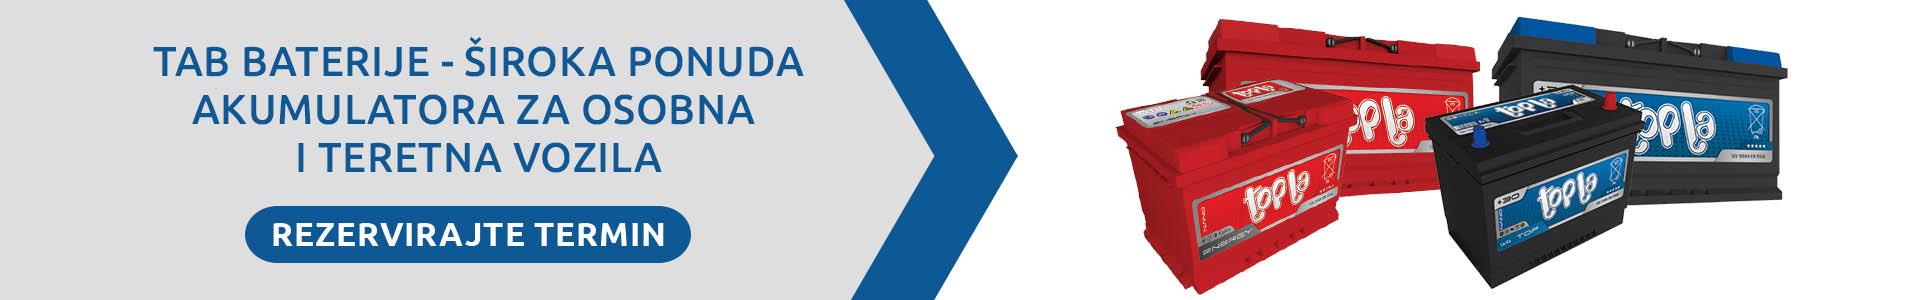 jadrantrans-tab-baterije-web